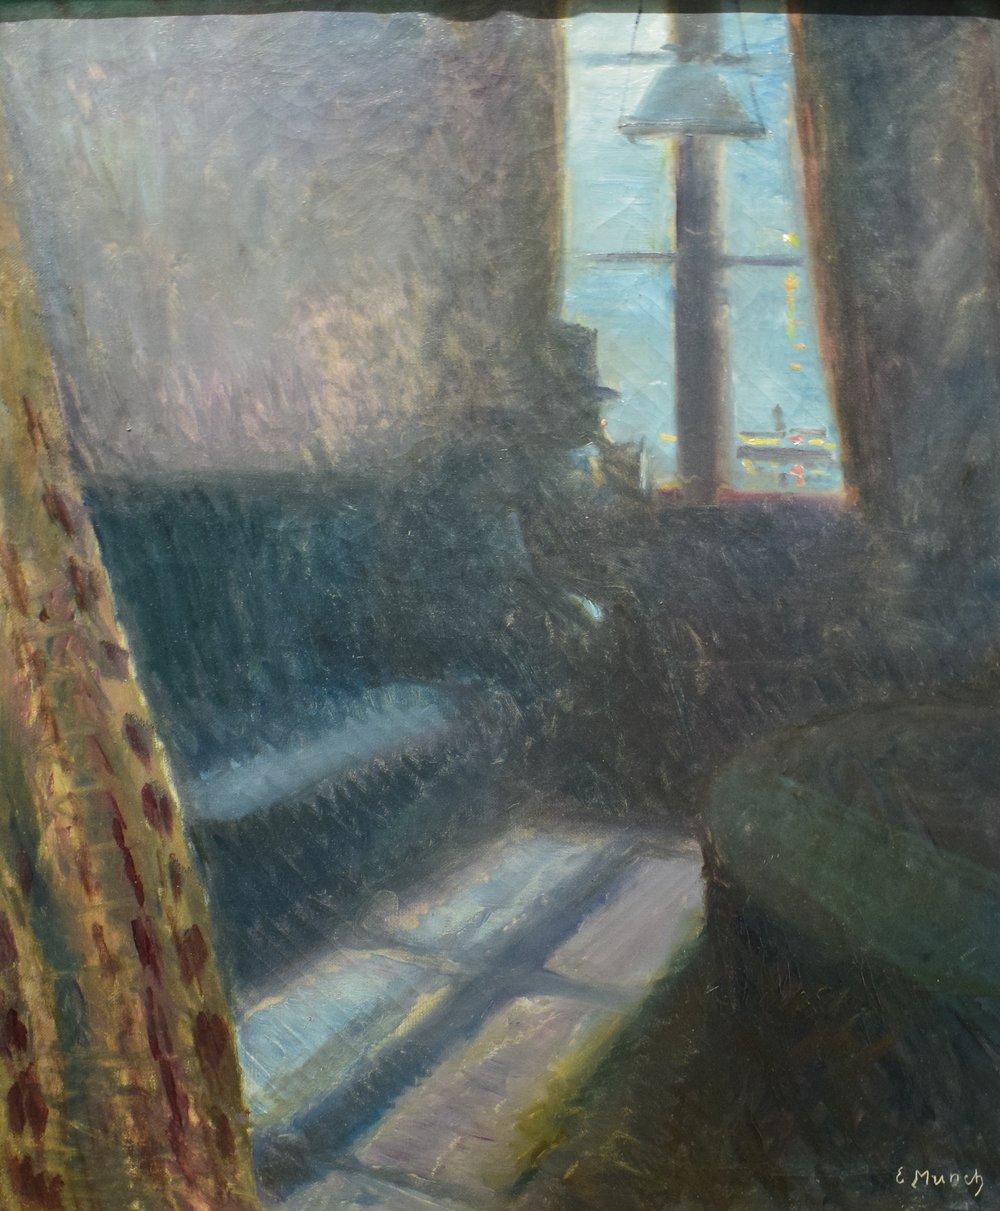 Edvard Munch, Nigh in Saint-Cloud, 1890, Nasjonalmuseet